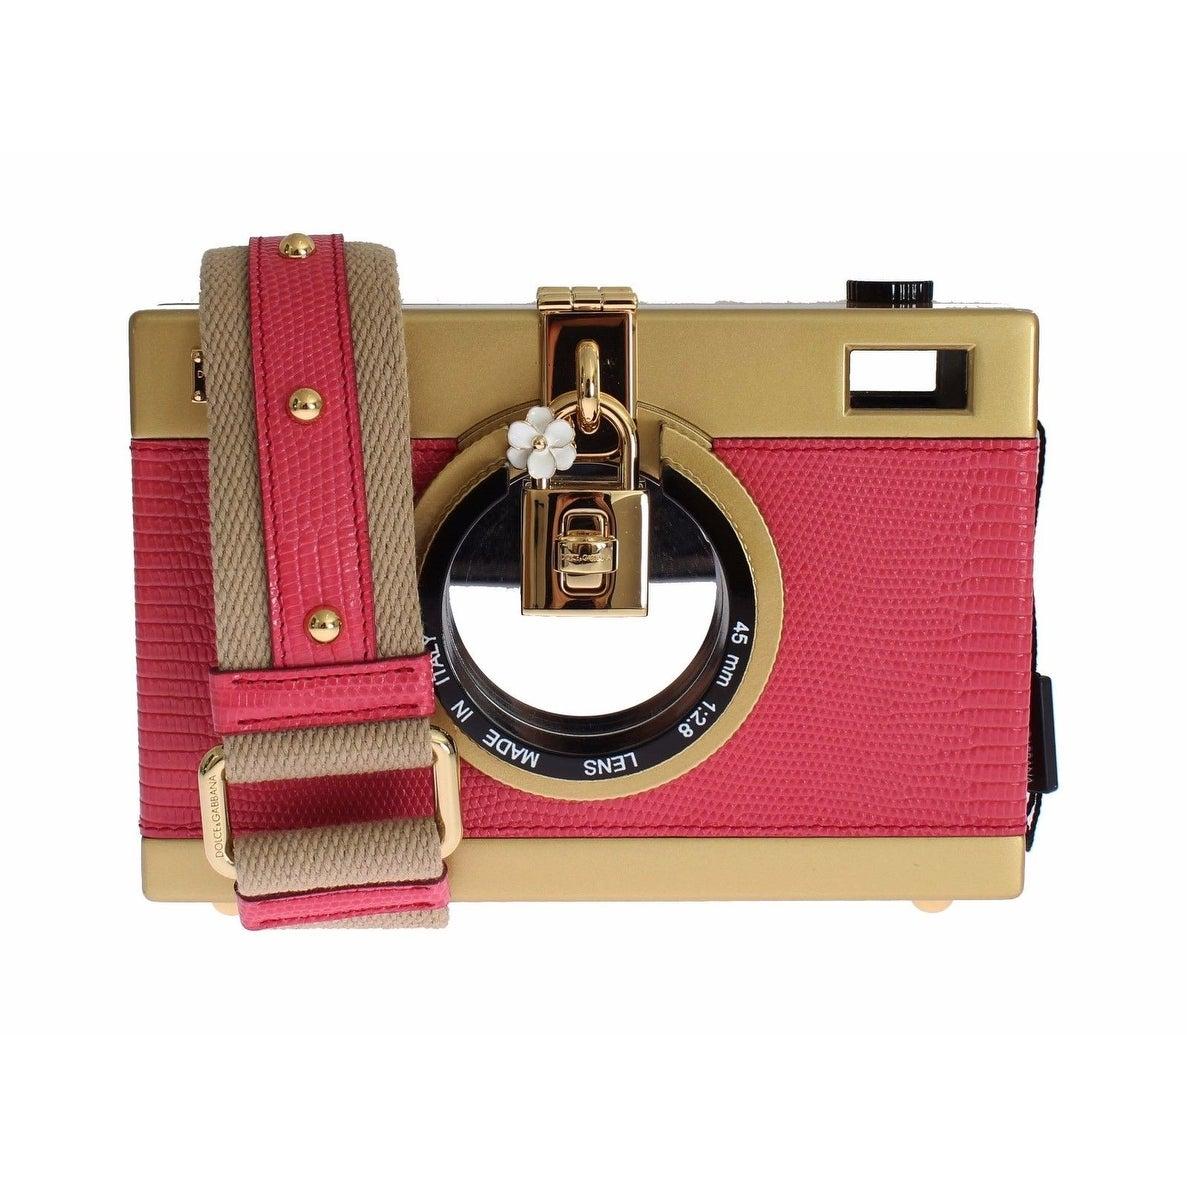 aa91bedff761 Dolce   Gabbana Dolce   Gabbana Camera Case Pink Leather Gold Shoulder Bag  Clutch - One size